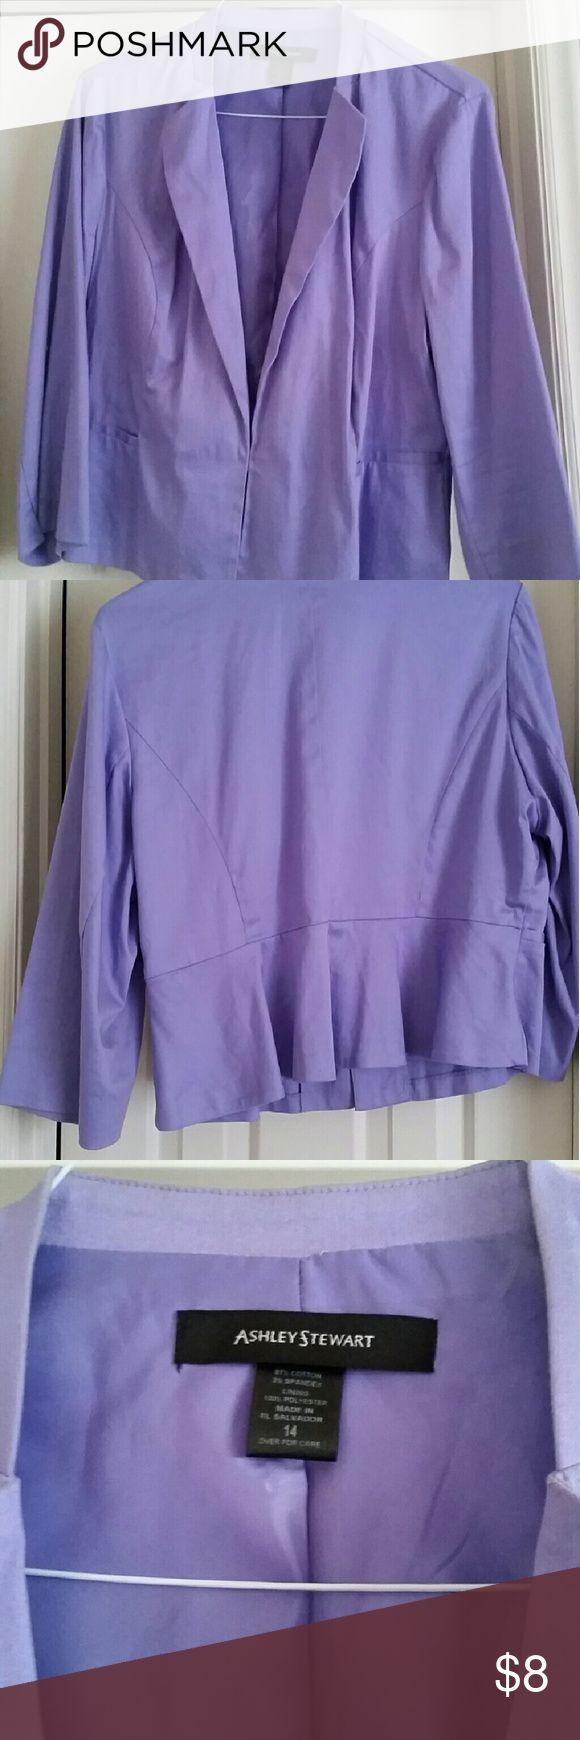 Ashley Stewart lavender blazer Lavender blazer with hook closure. Peplum back. Ashley Stewart Jackets & Coats Blazers